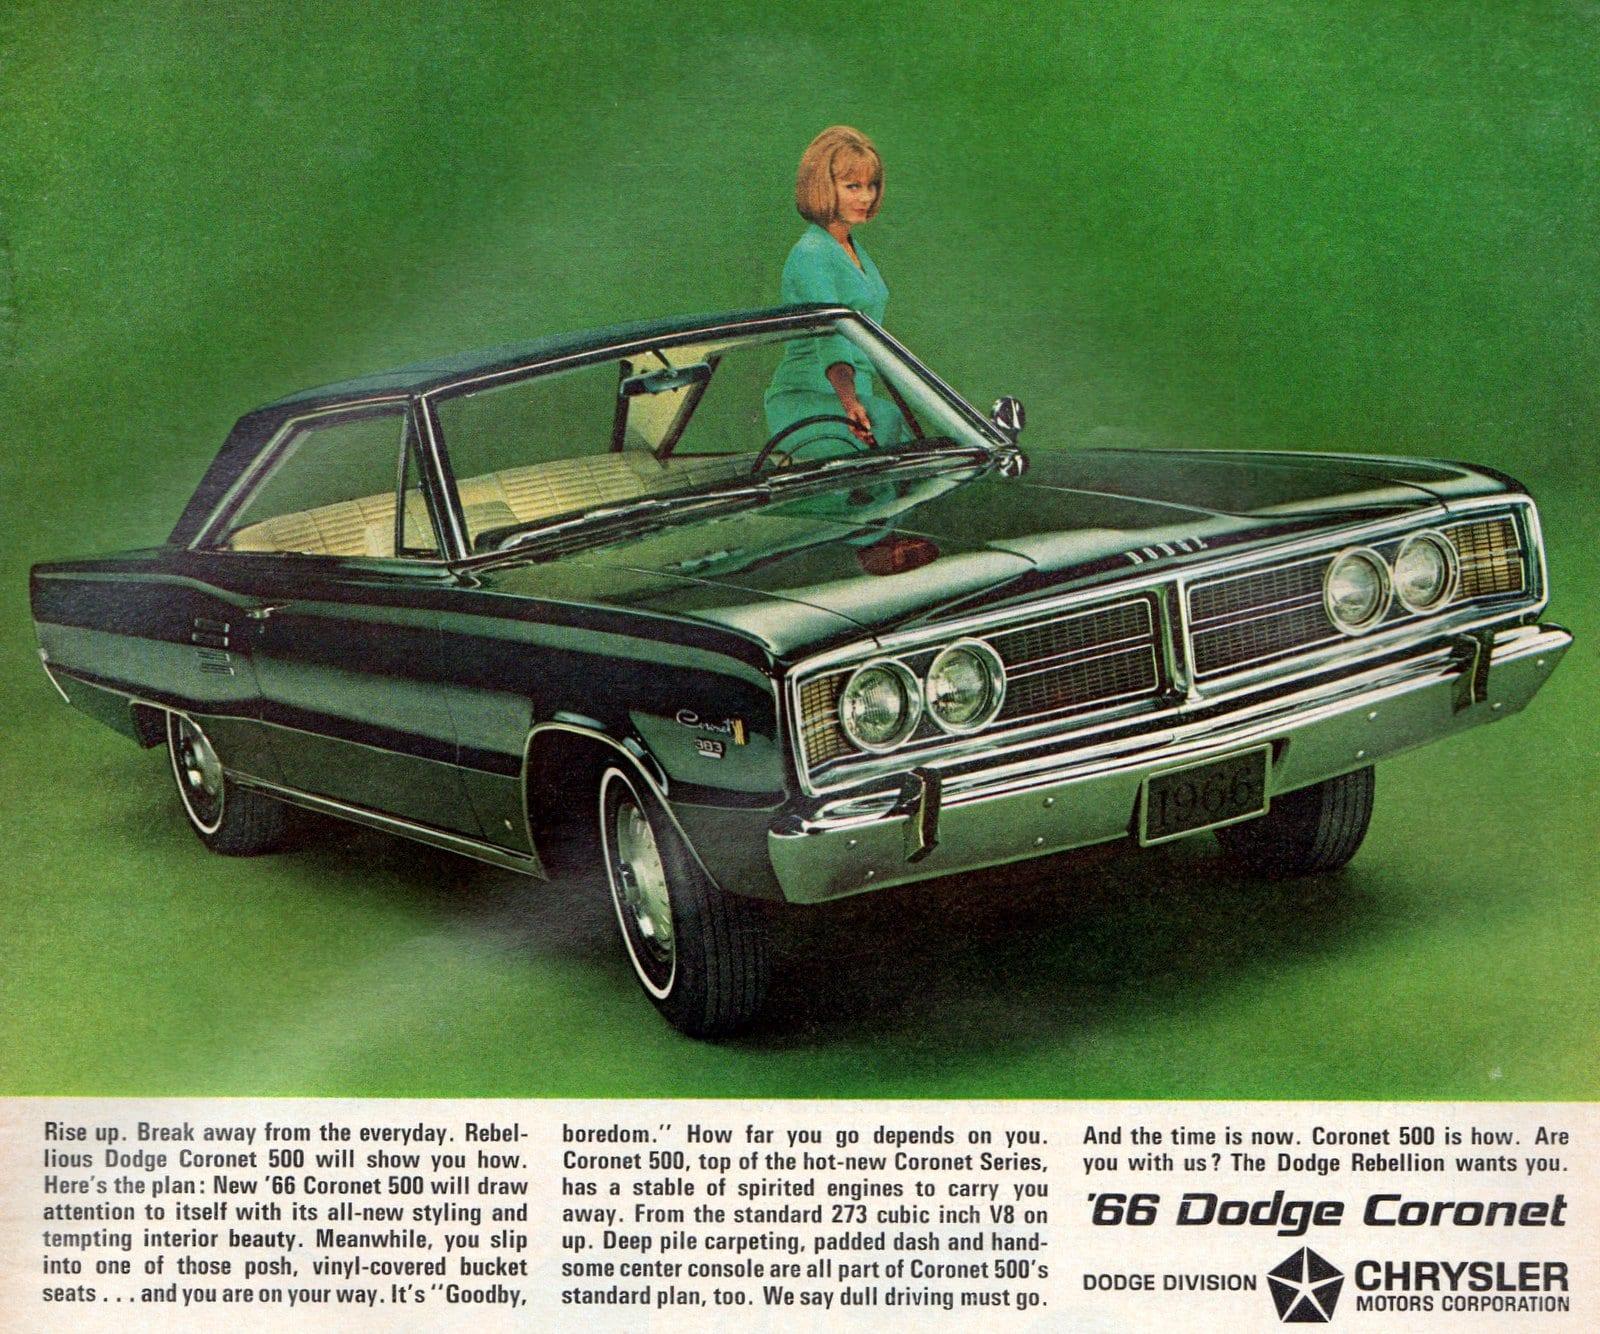 1966 Dodge Coronet cars